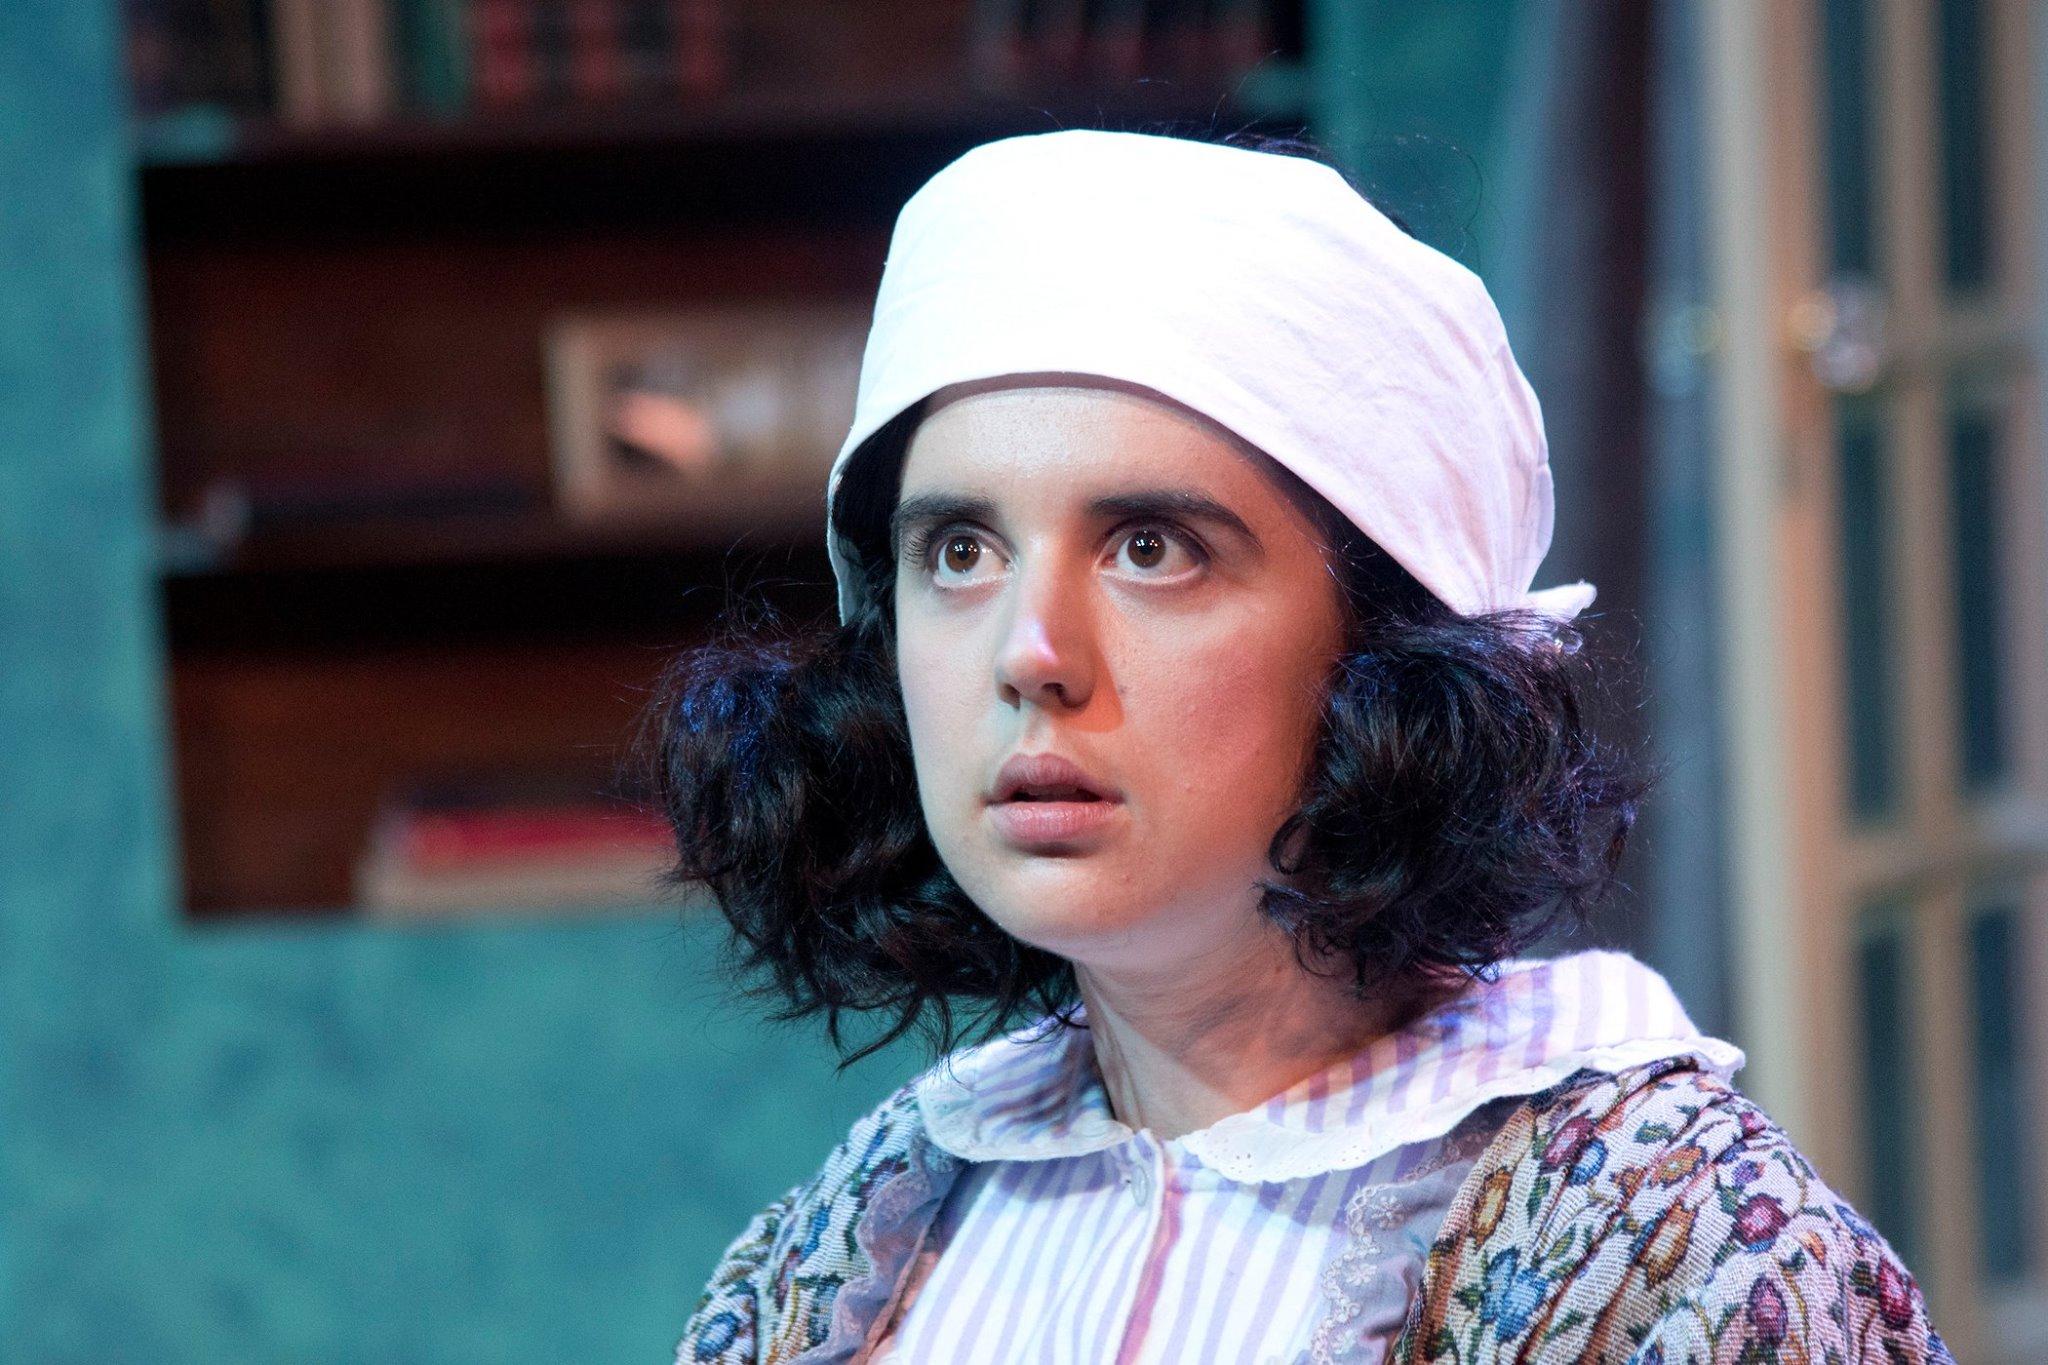 Annapolis Shakespeare Company's 2018 production of Blithe Spirit. Directed by Sally Boyett. Photo by Joshua McKerrow.